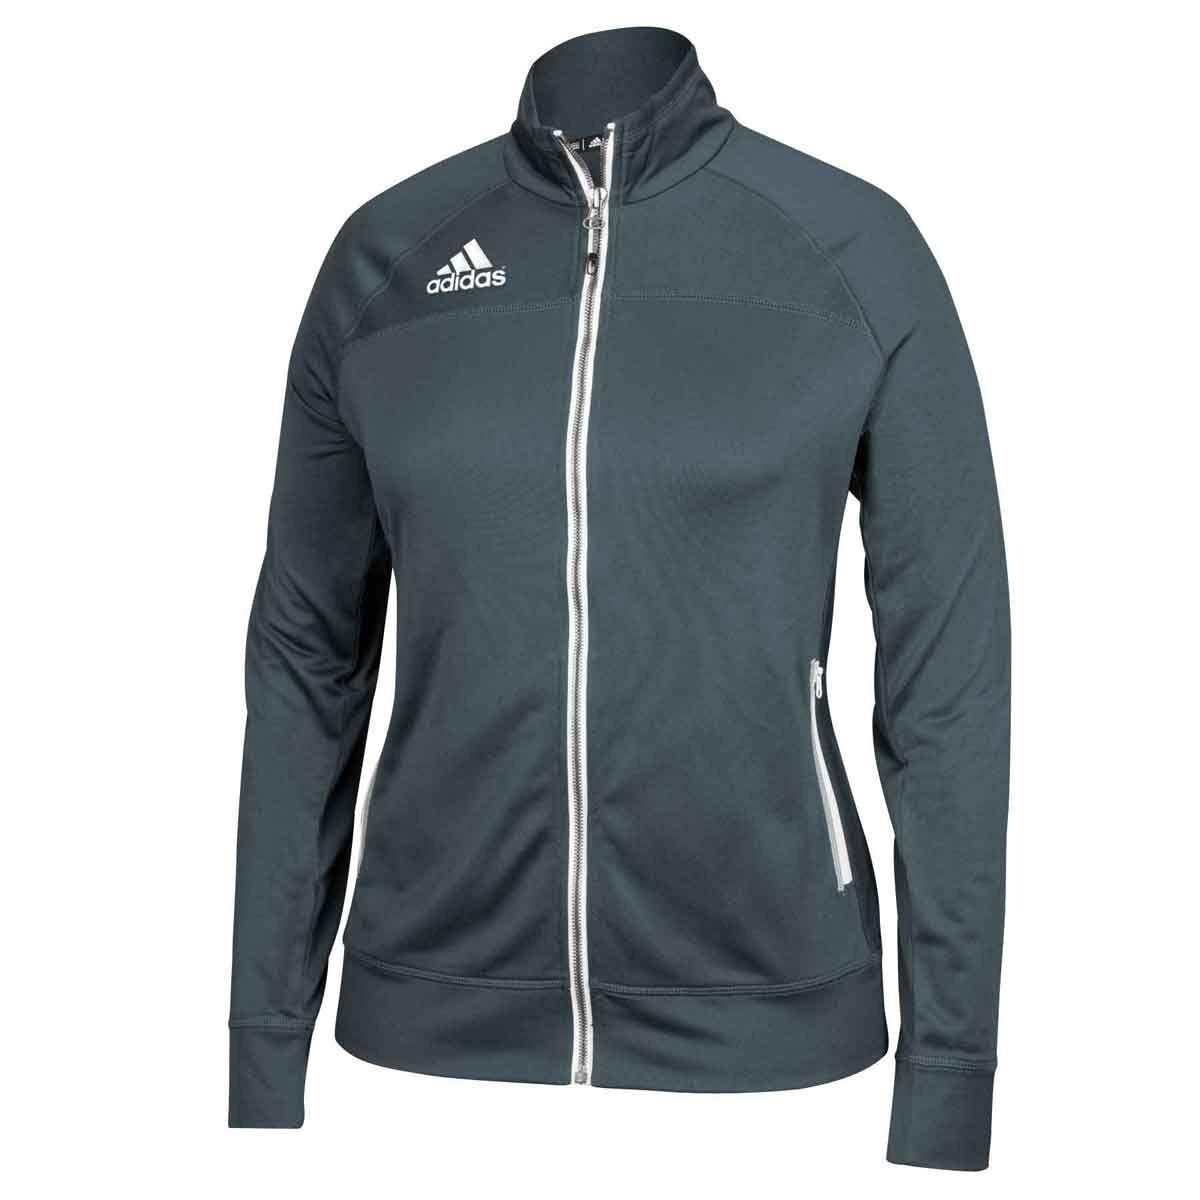 401347f0cec80 adidas Women's Onix Climalite Utility Jacket | Products | Adidas ...